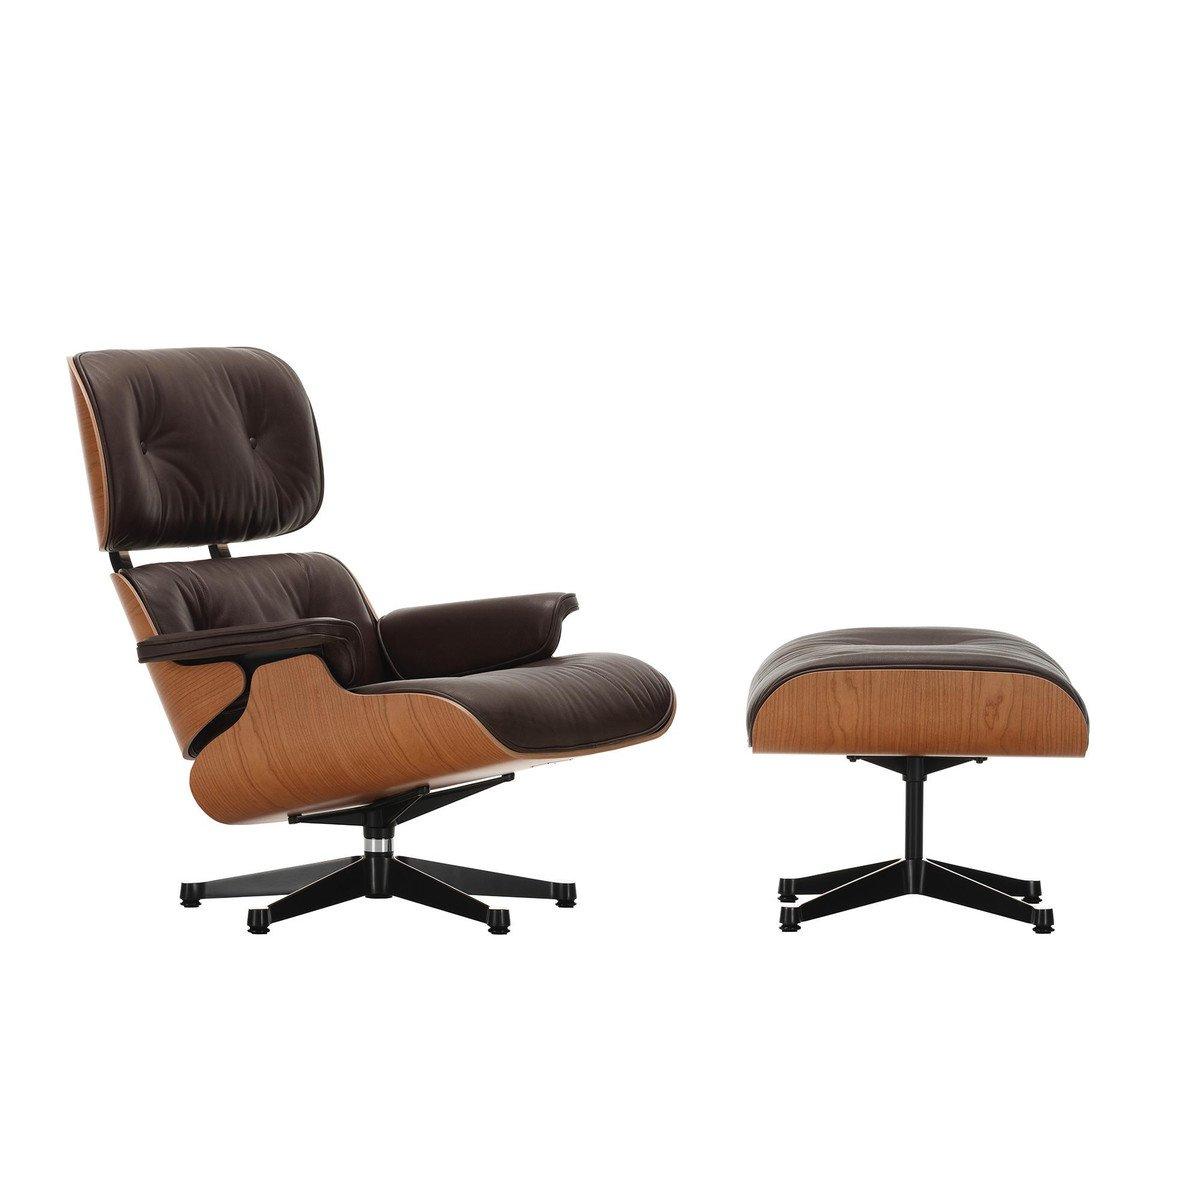 Sessel Eames eames lounge chair sessel ottoman vitra ambientedirect com